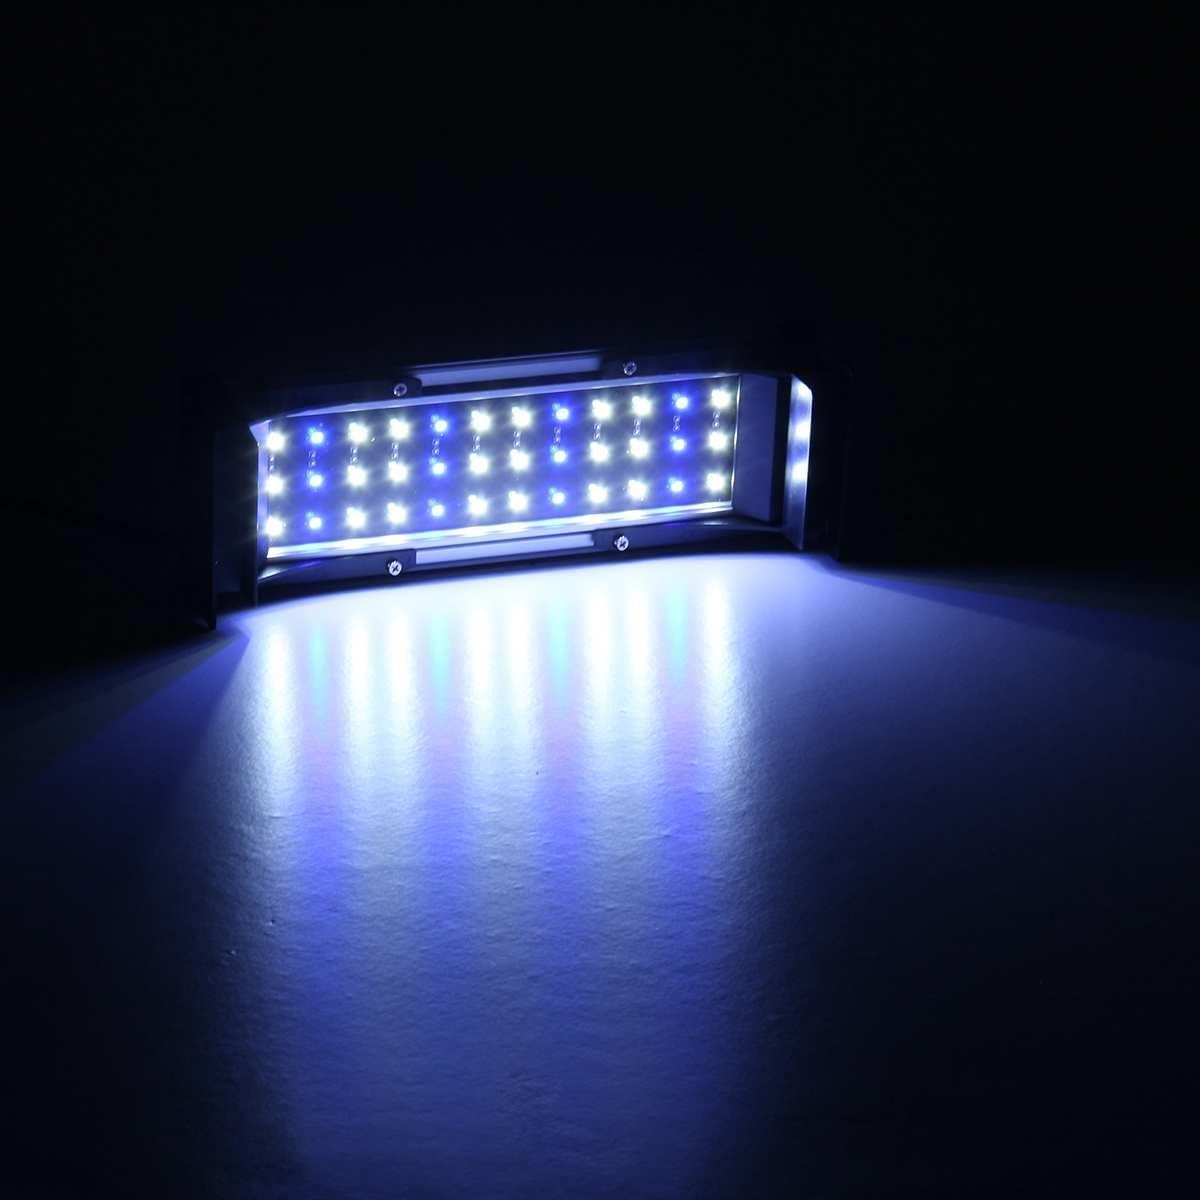 Aquarium Light Blue/White Bar  Lamp 30-120cm Adjustable Dimmable Light